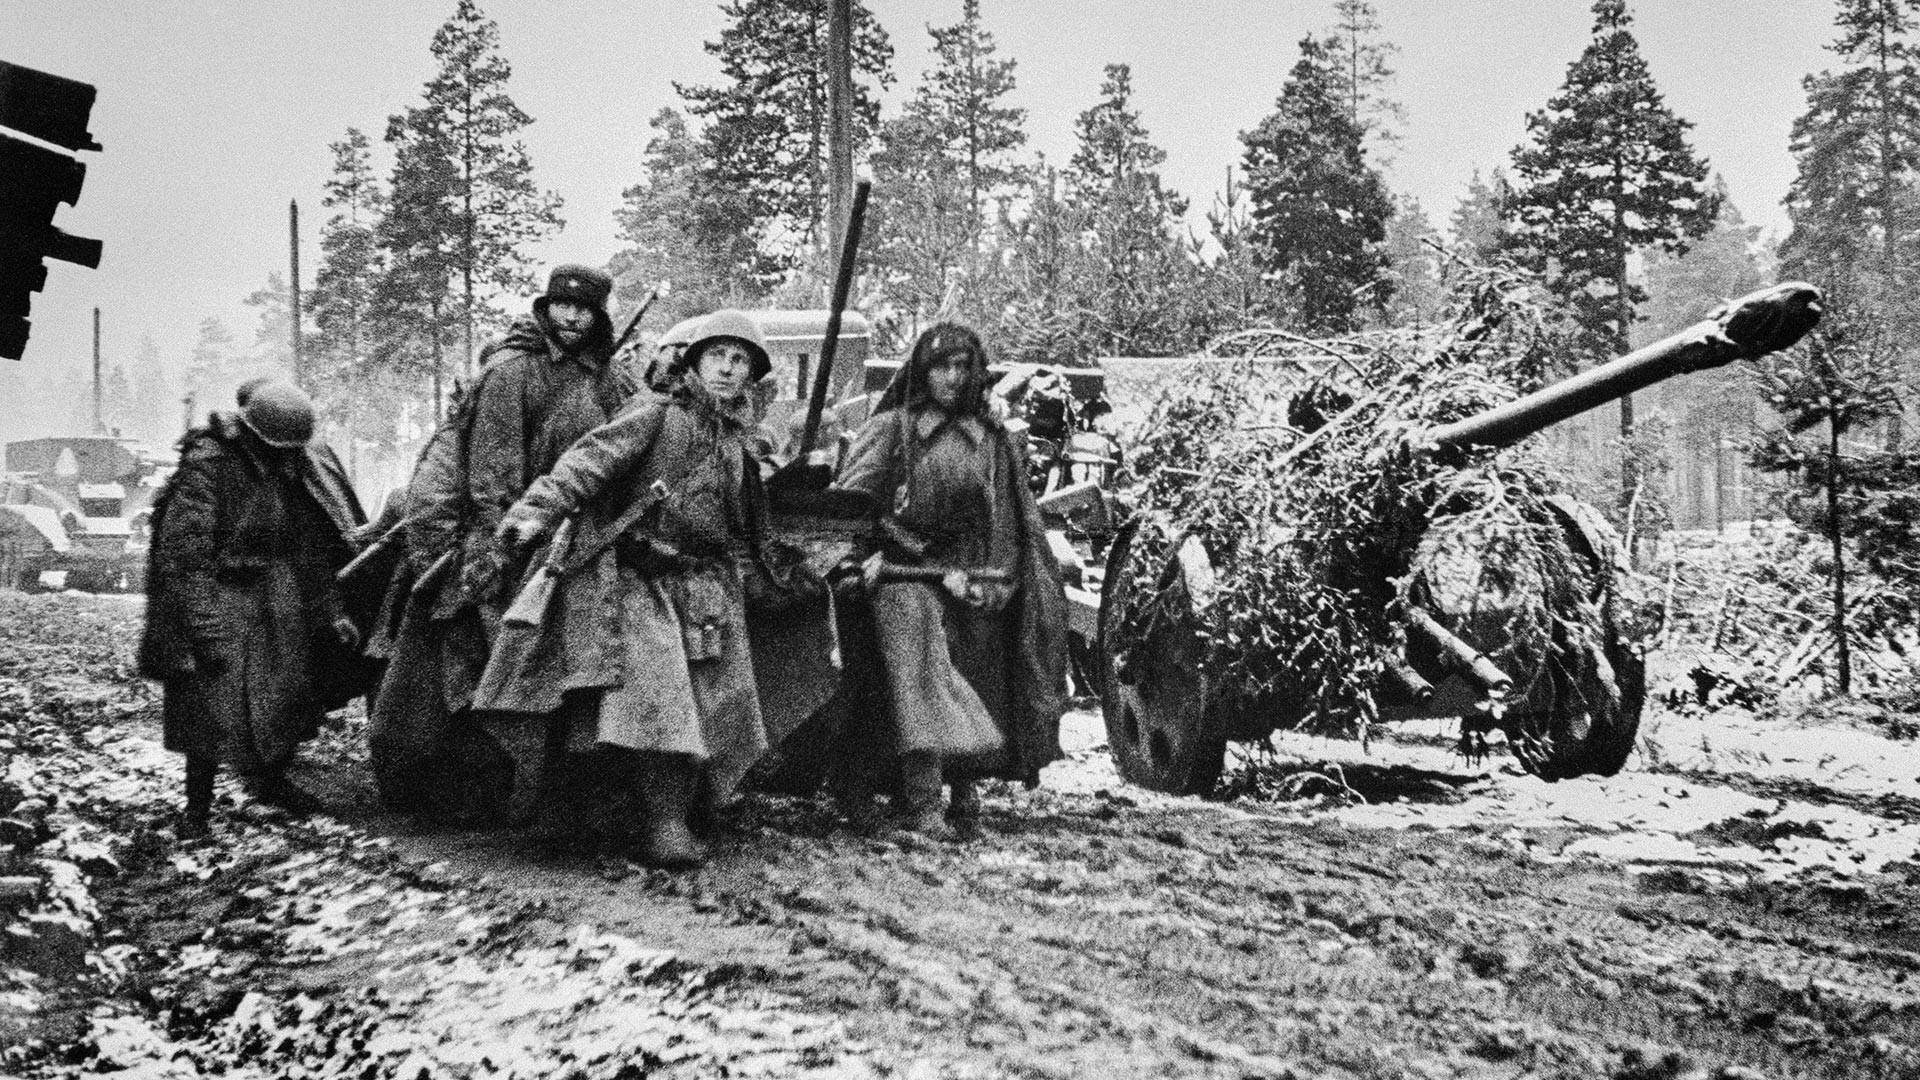 Друга сињавинска операција, транспорт камуфлираног противтенковског топа Ф-22 преко блата по раскаљаним путевима. Лењинградски фронт.